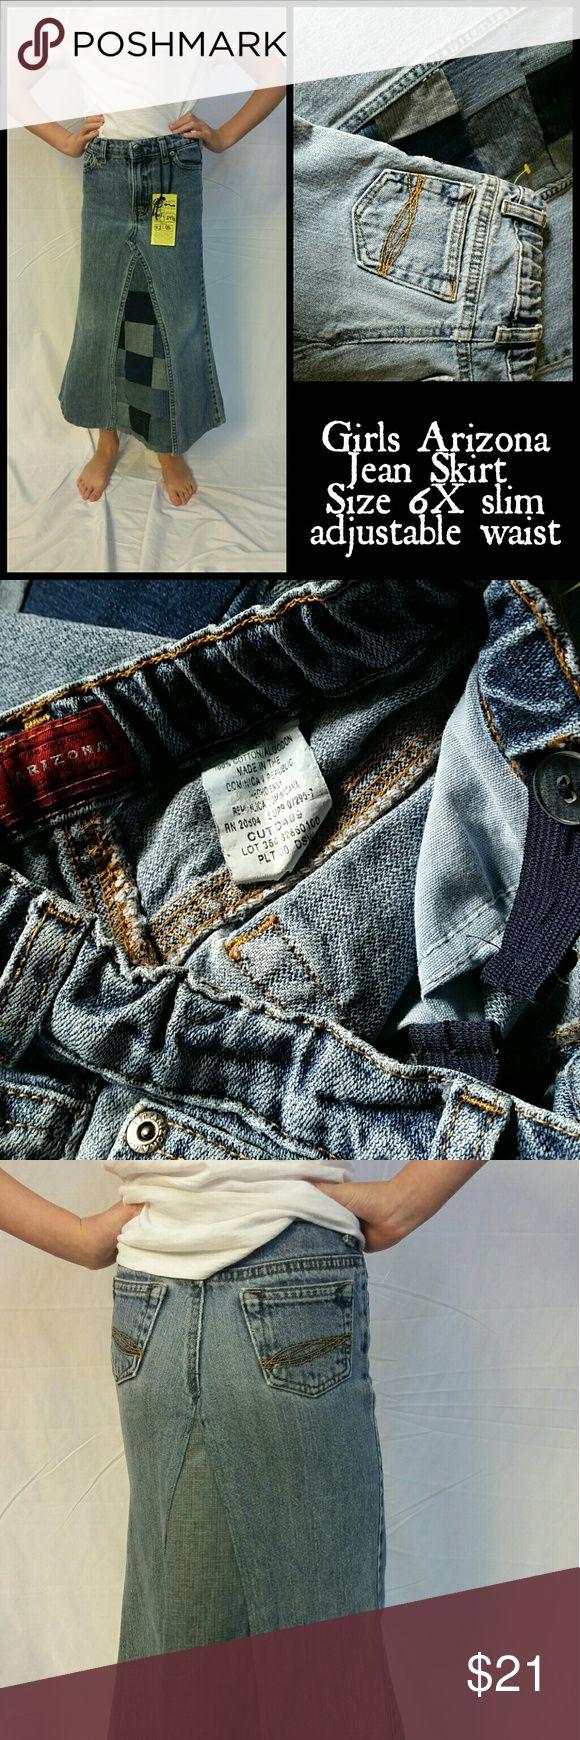 "Girls Arizona Jean Skirt. Size 6x slim. Modest Hard to find modest, no splits, long jean skirt. Arizona Brand Jeans Company. Size 6x with inner adjustable button/elastic waist. Measurements taken when lying flat: waist 11"" hips 12"" length 24 1/2"".  Artistic Multicolor square denim inlay. Arizona Jean Company Bottoms Skirts"